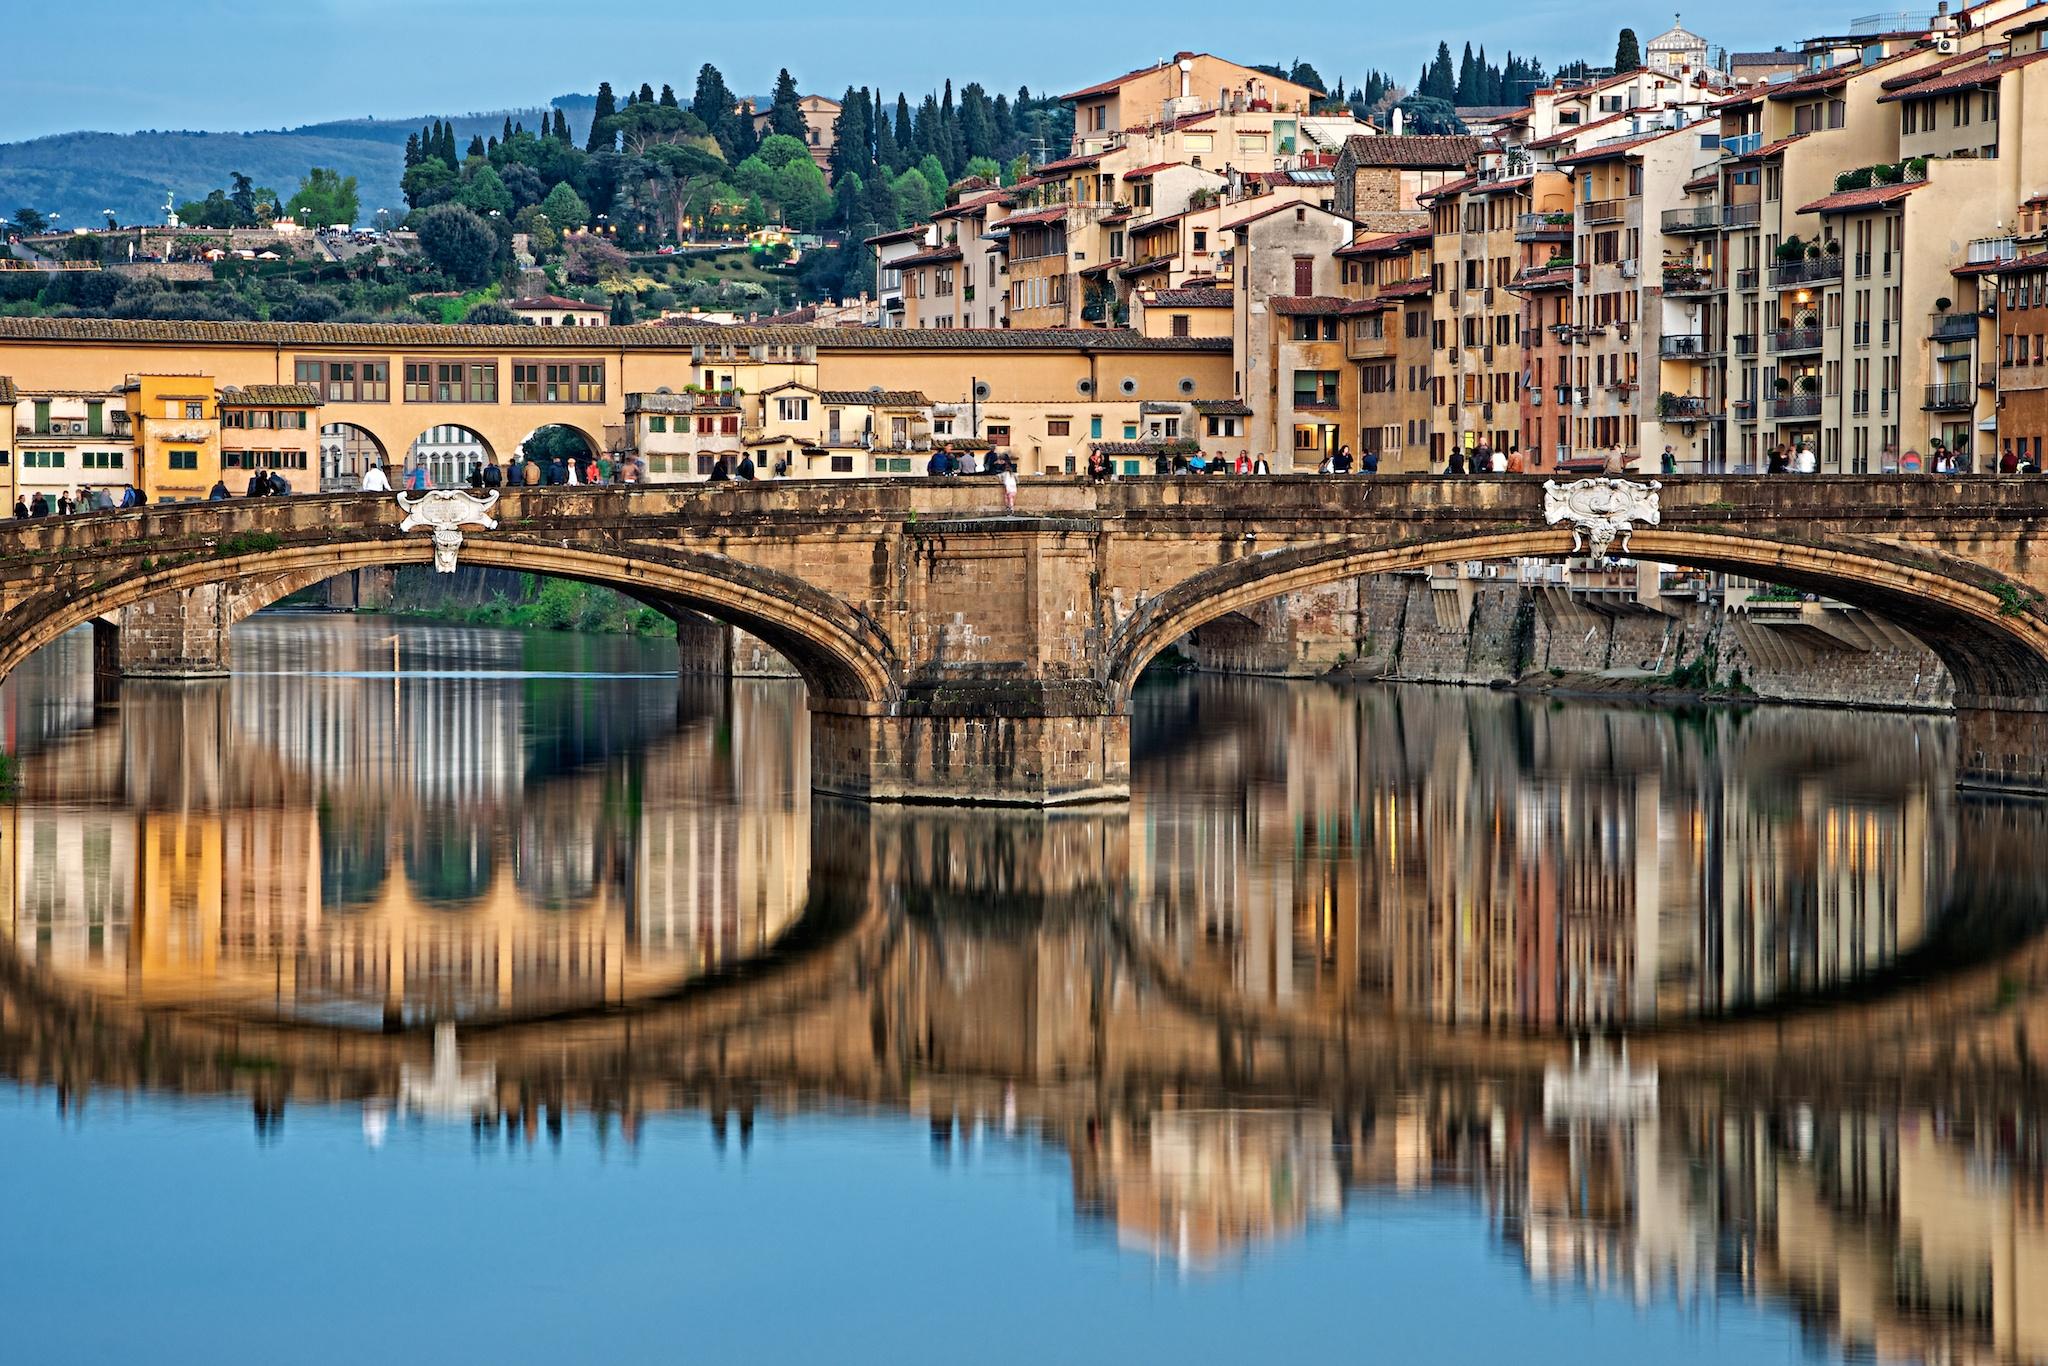 Ponte Santa Trinita & Ponte Vecchio, Florence, Italy